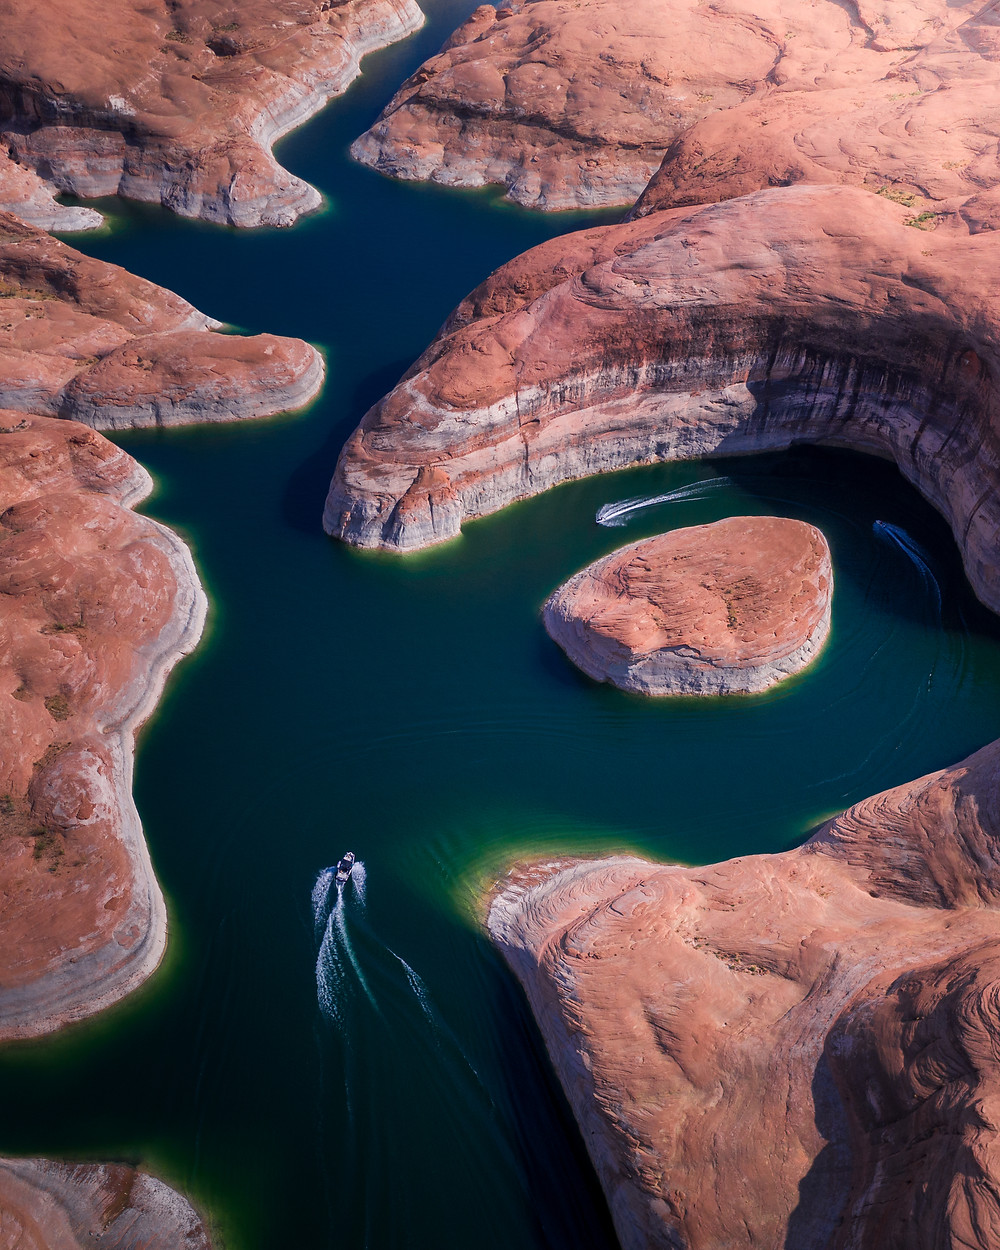 Jet Skiing through Lake Powell Canyons